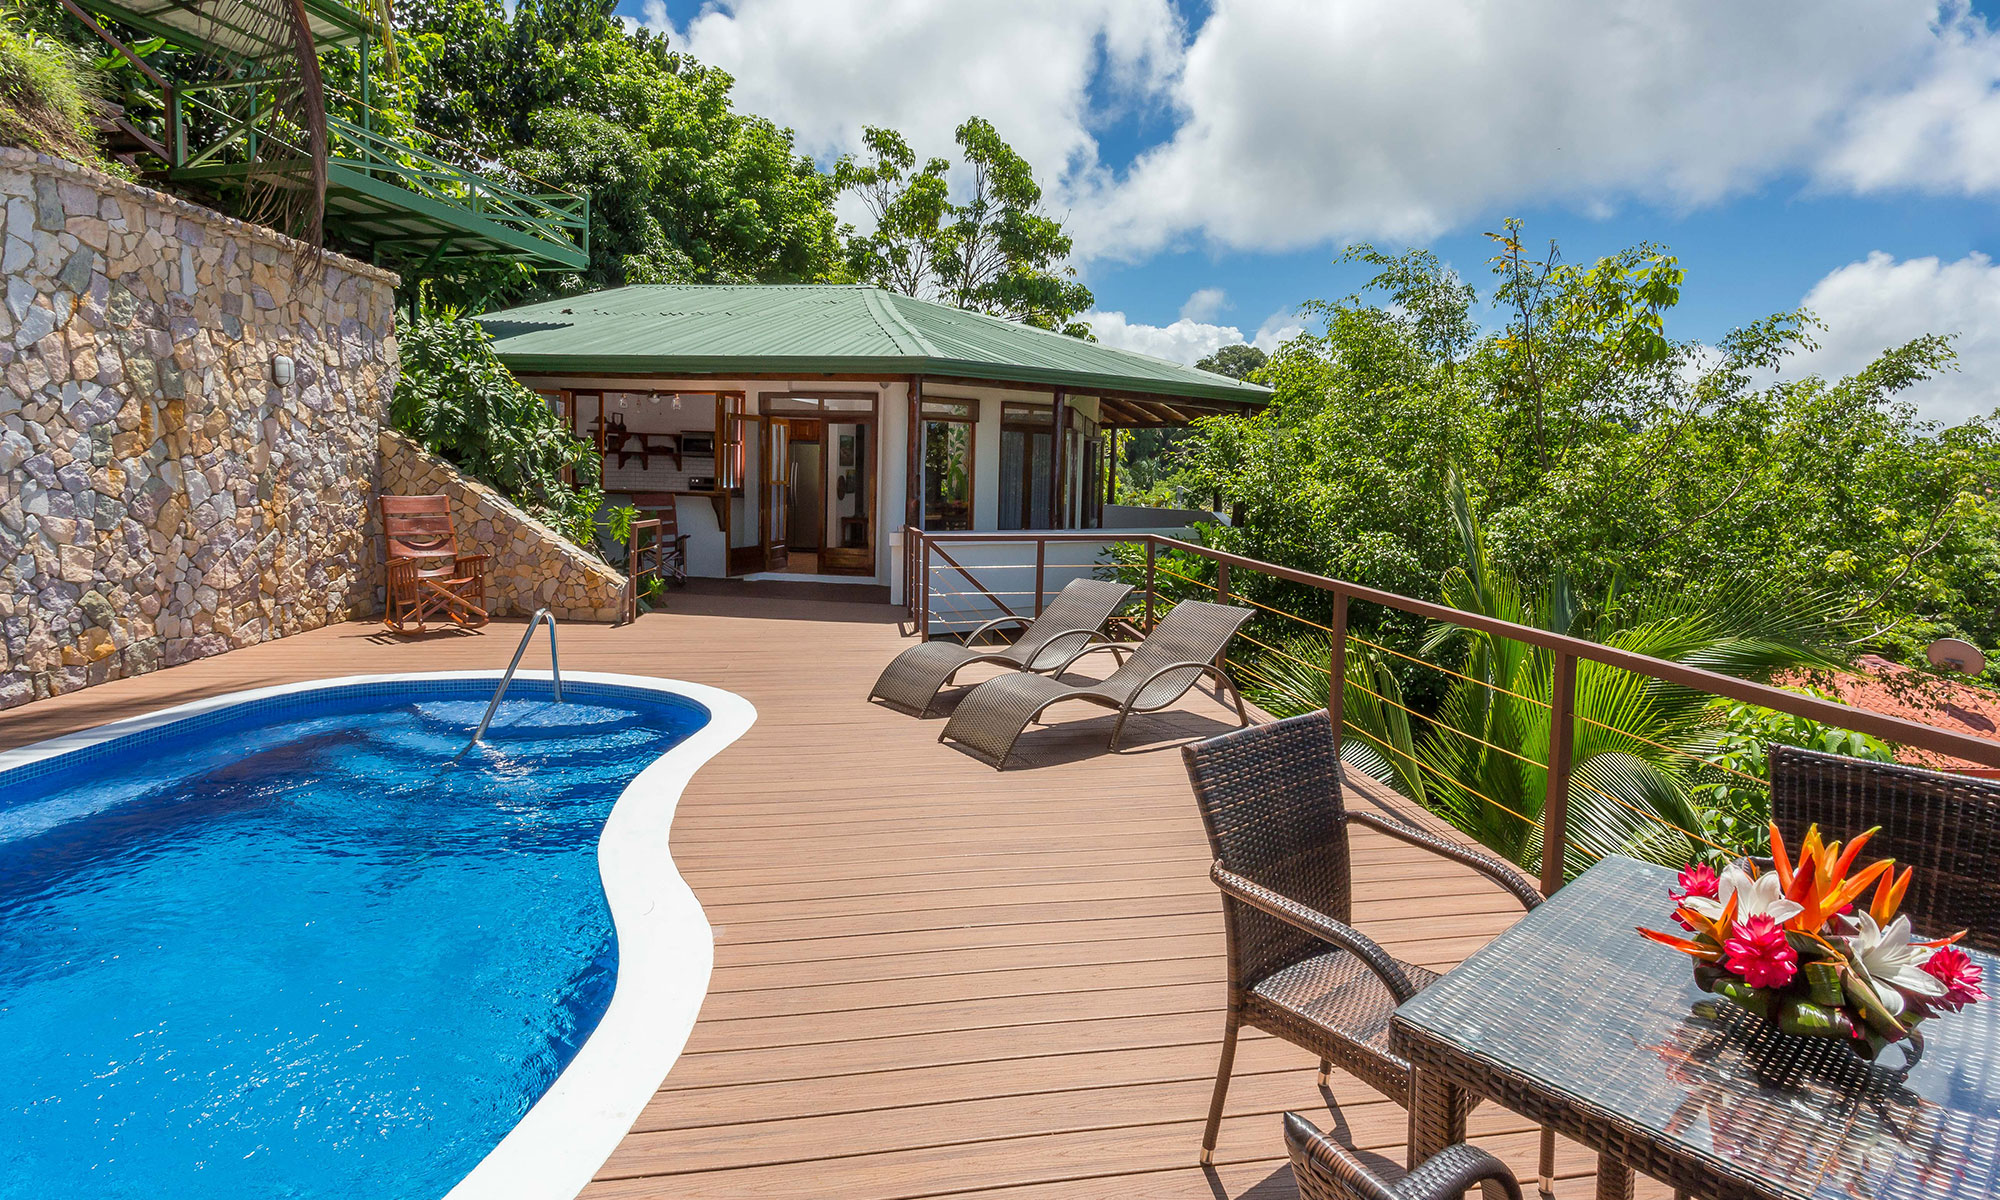 Villa Natura pool and sun deck